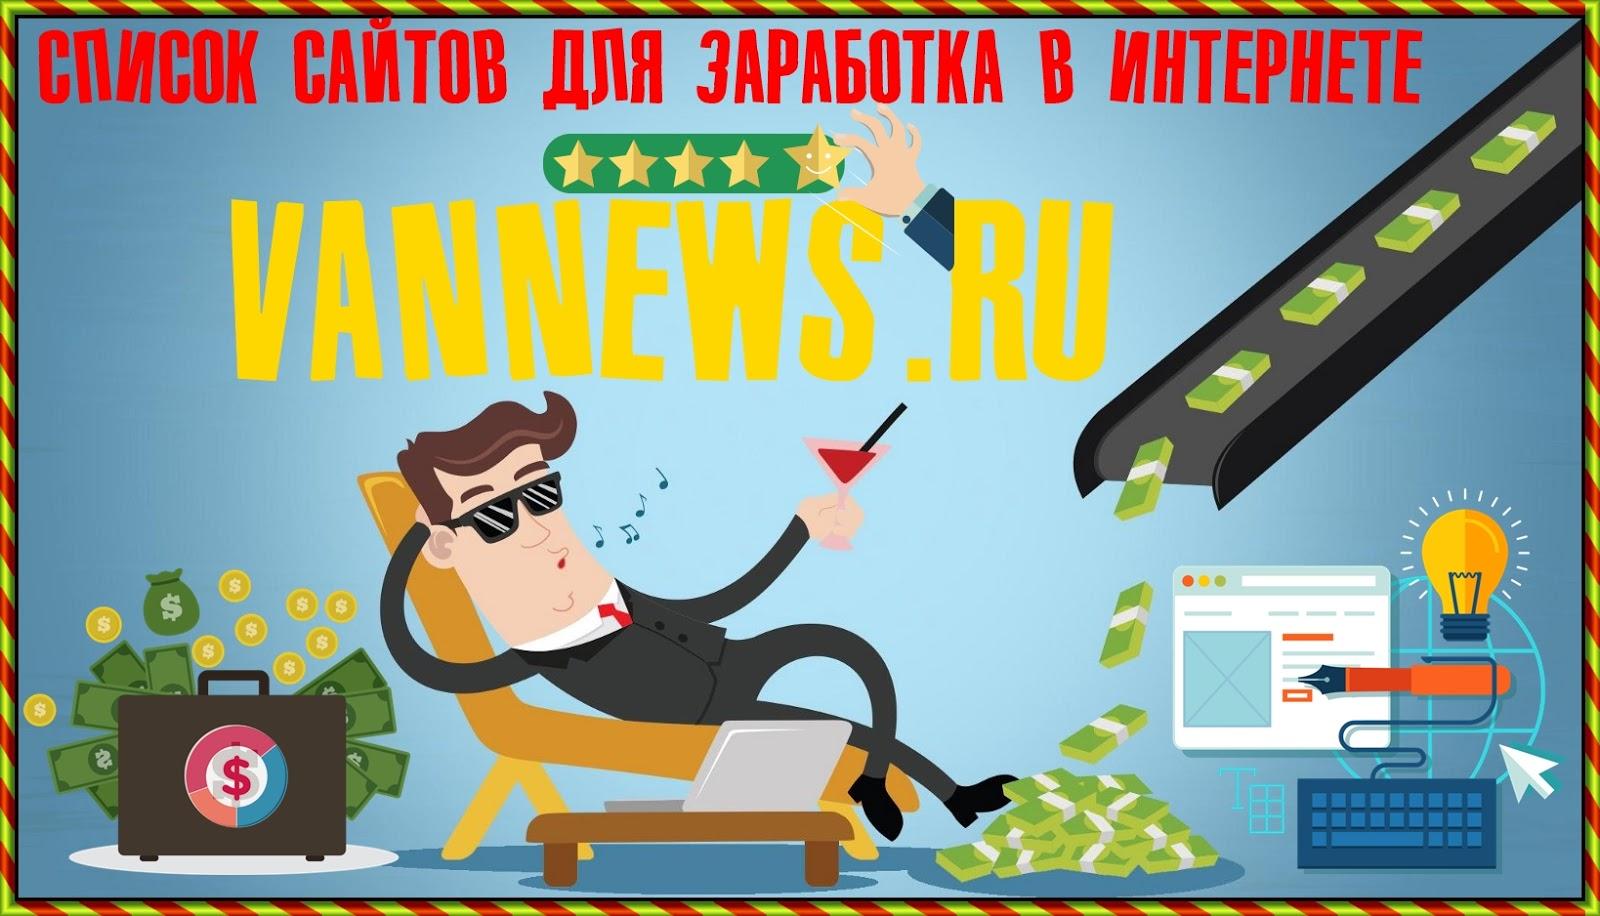 заработок в интернете заработок без вложений и без обмана